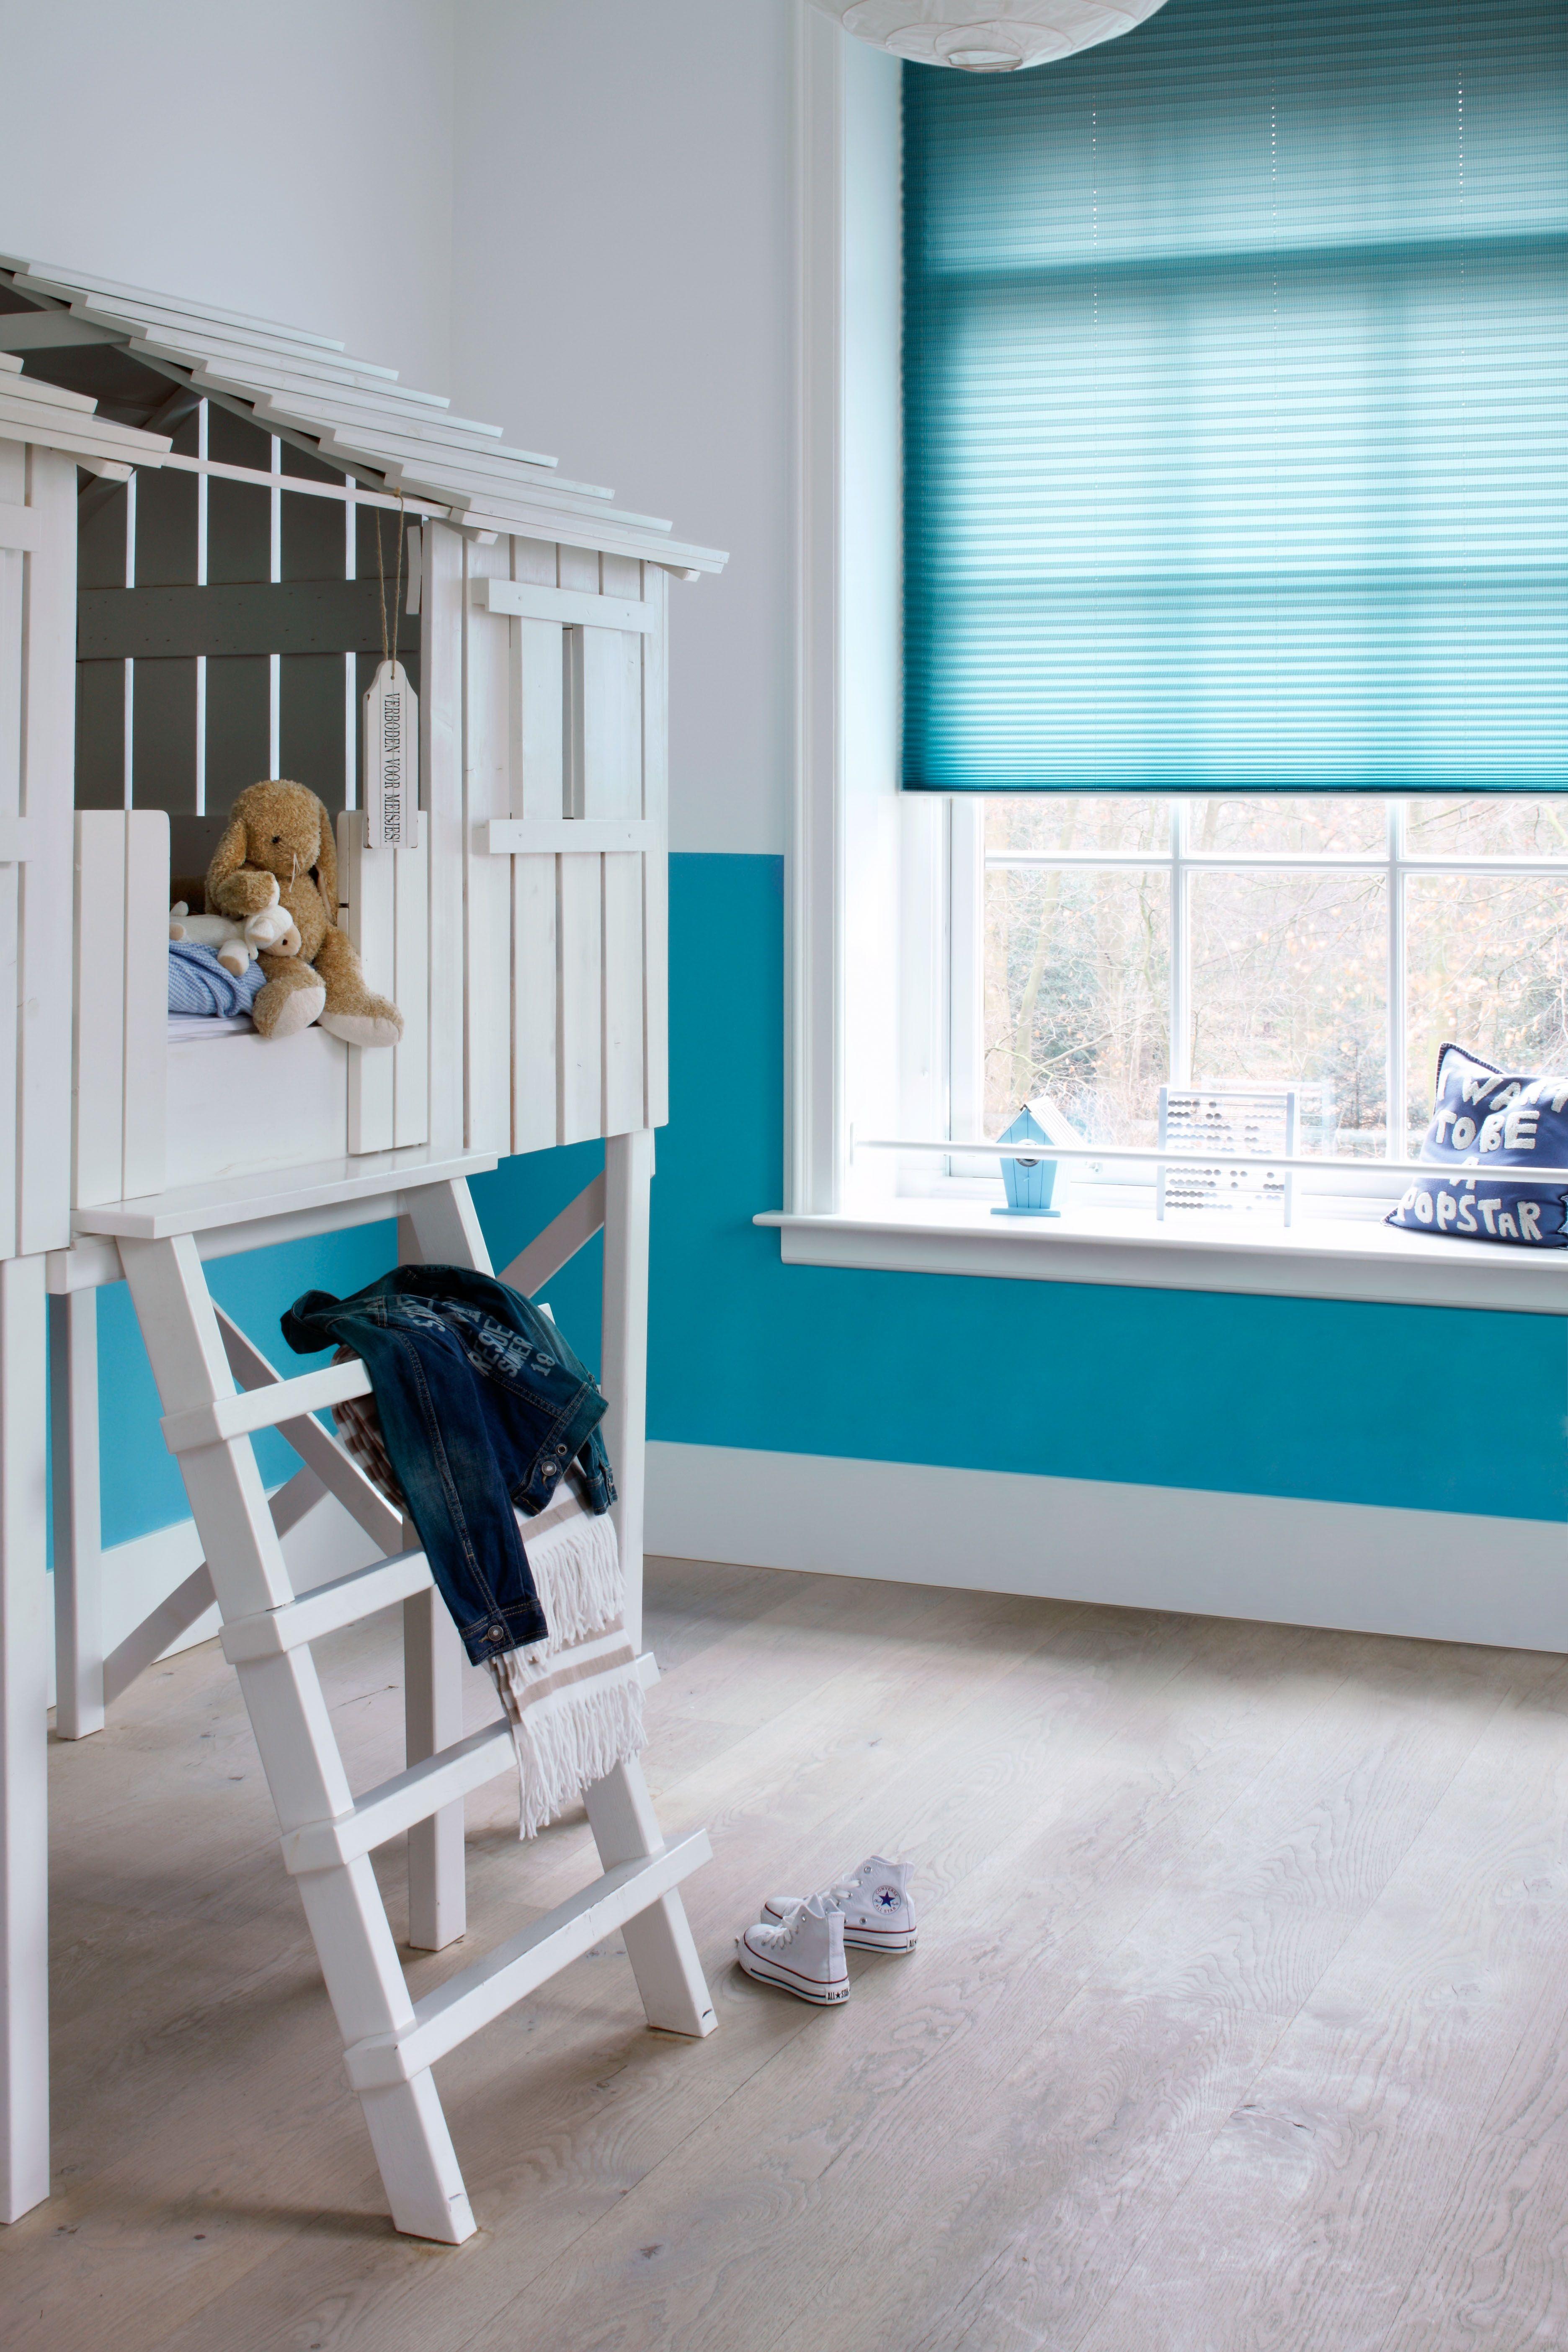 Felblauwe plisse shade in kinderkamer blauw fris trend foto ...